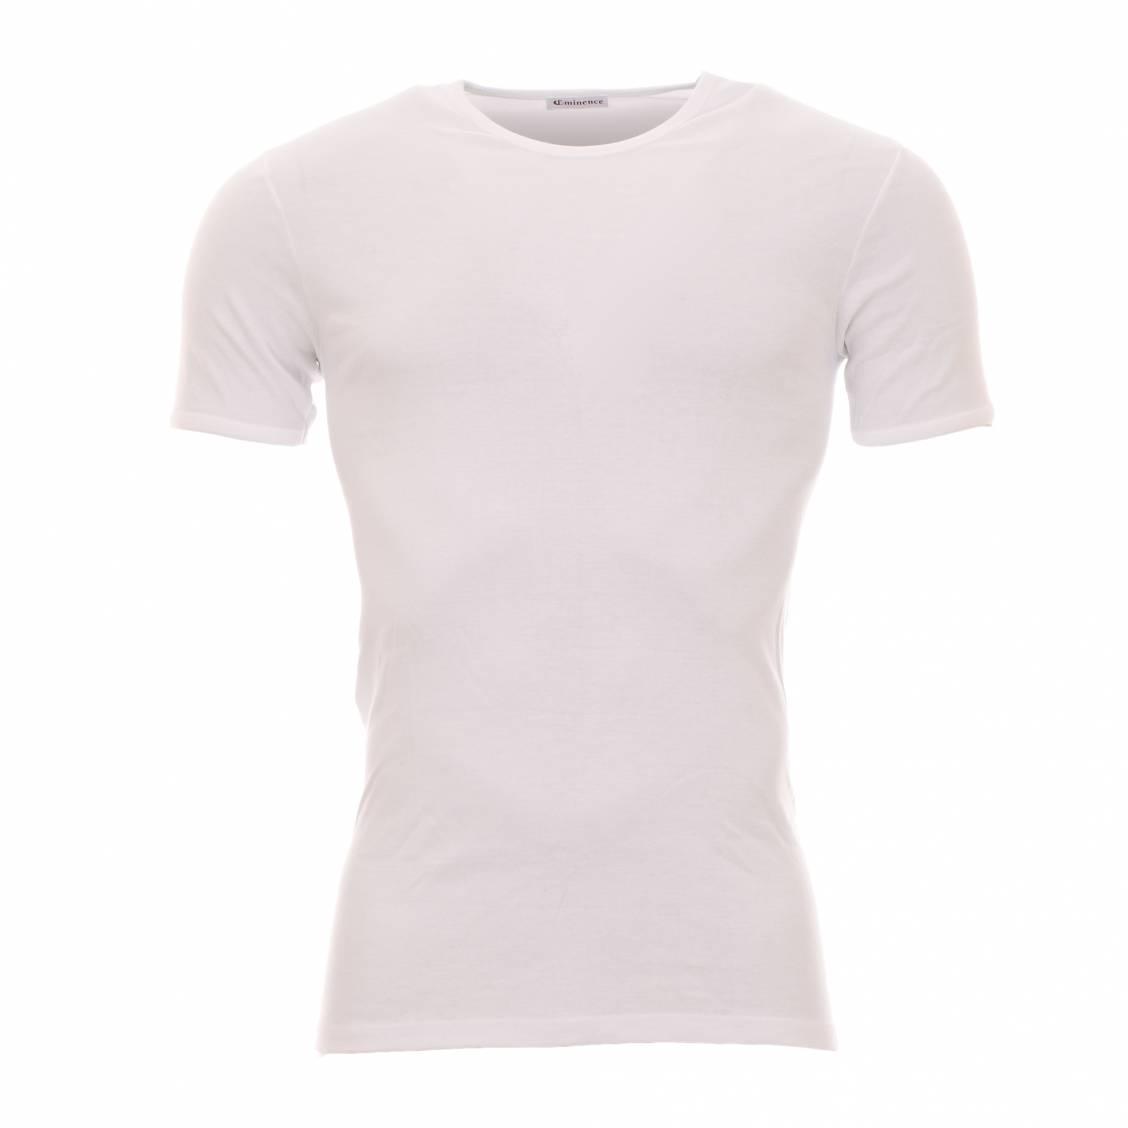 lot de 2 tee-shirts eminence blancs à col rond